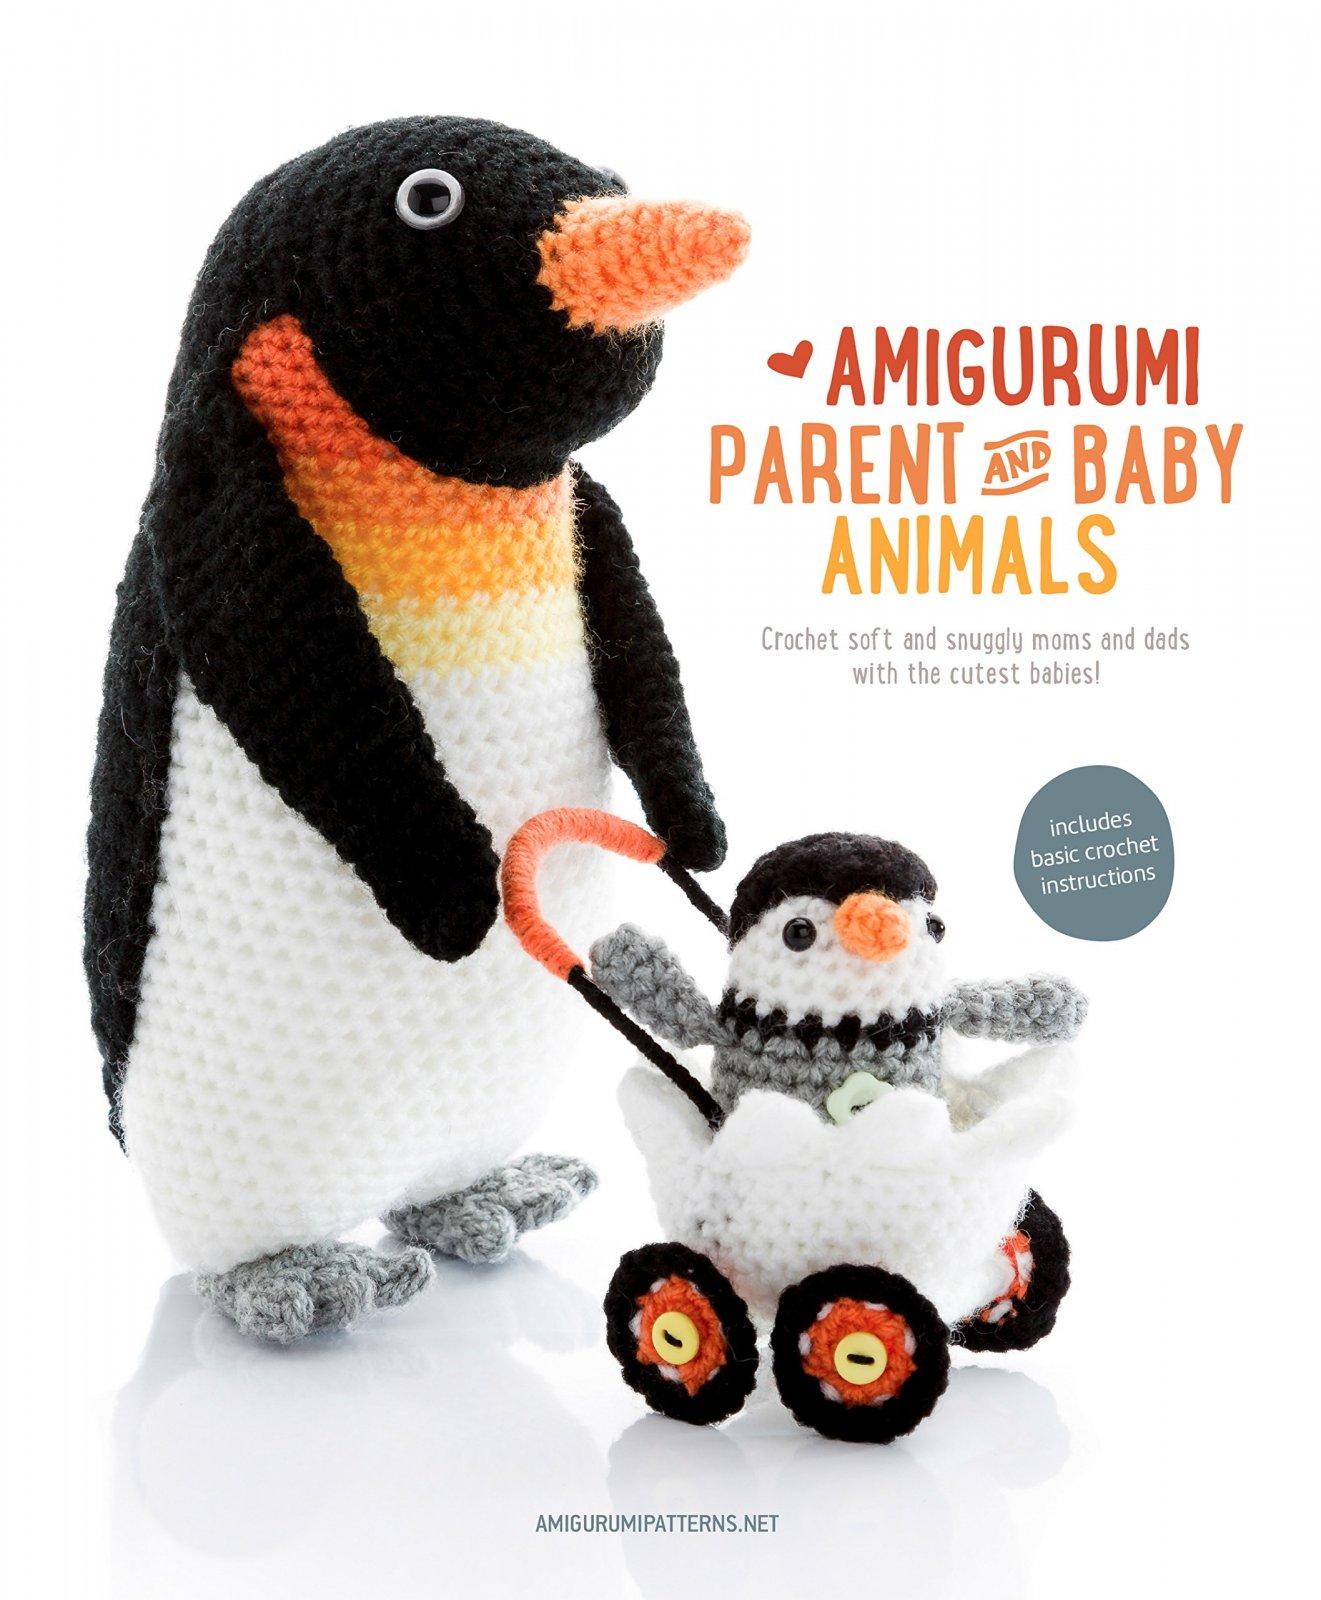 Book: Amigurumi Parent and Baby Animals